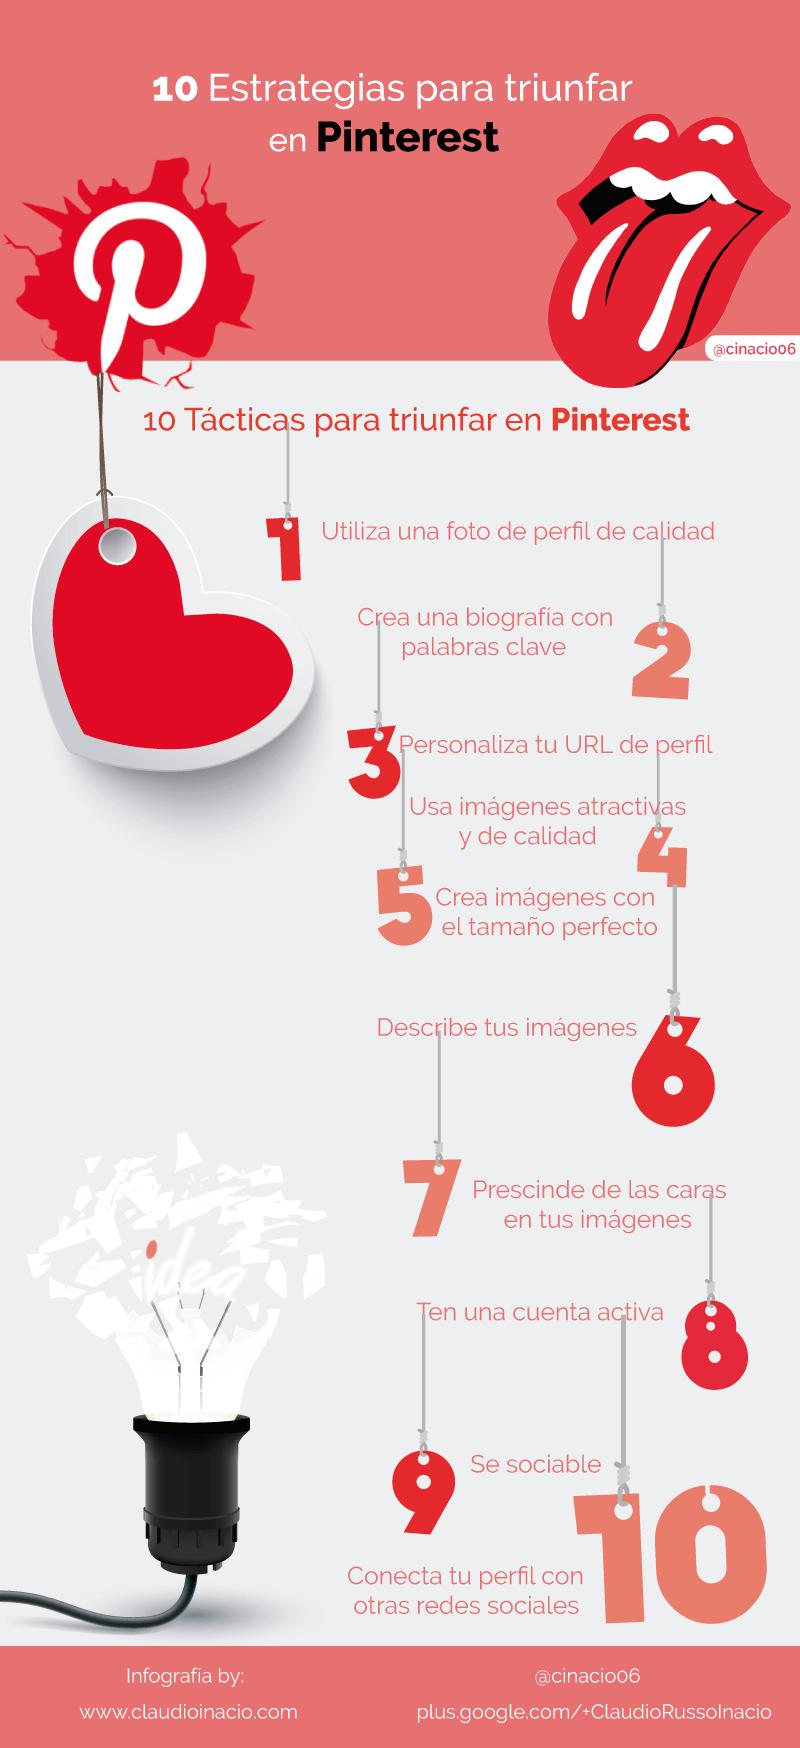 10 estrategias para triunfar en Pinterest